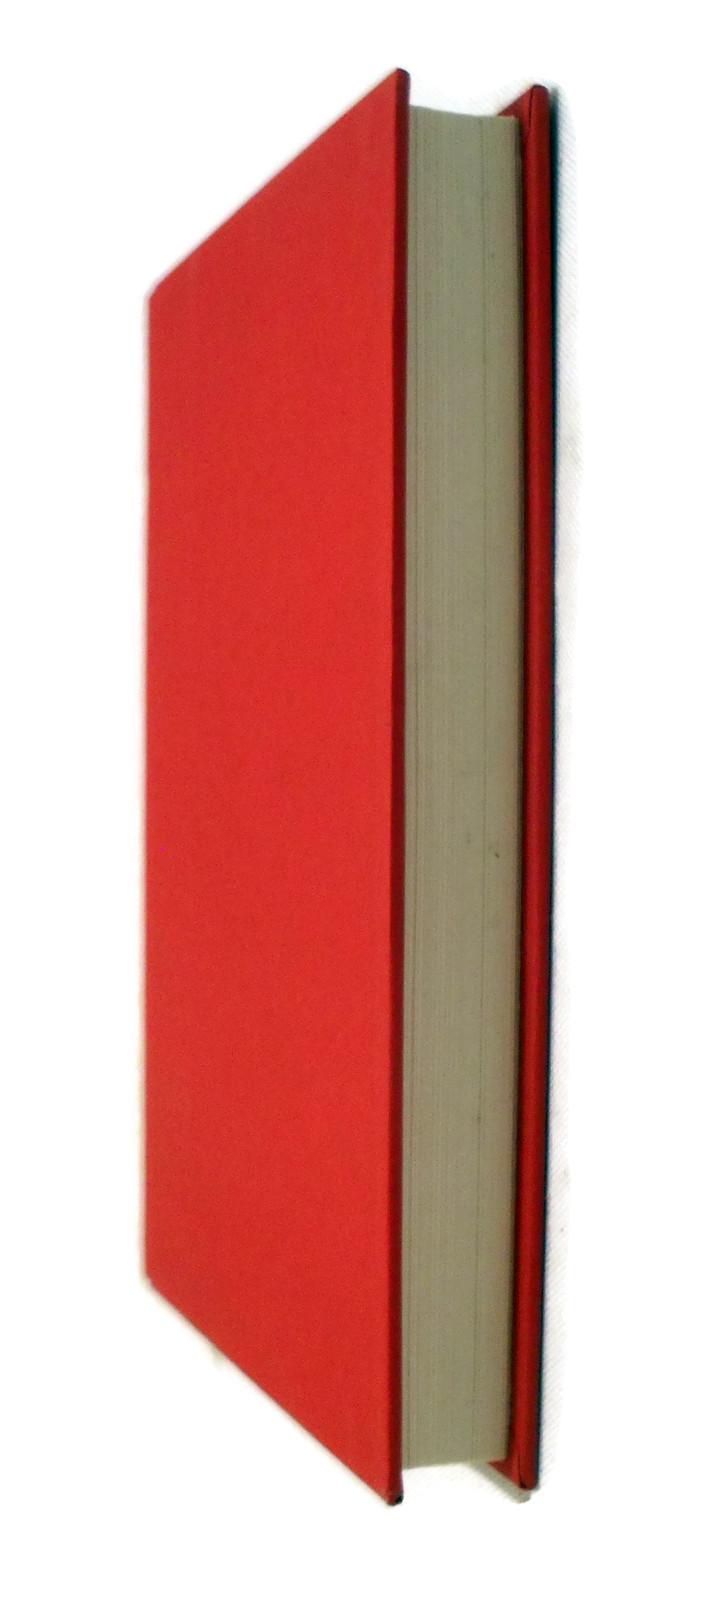 Debbie Macomber Shiry, Goodness & Mercy Book 2012